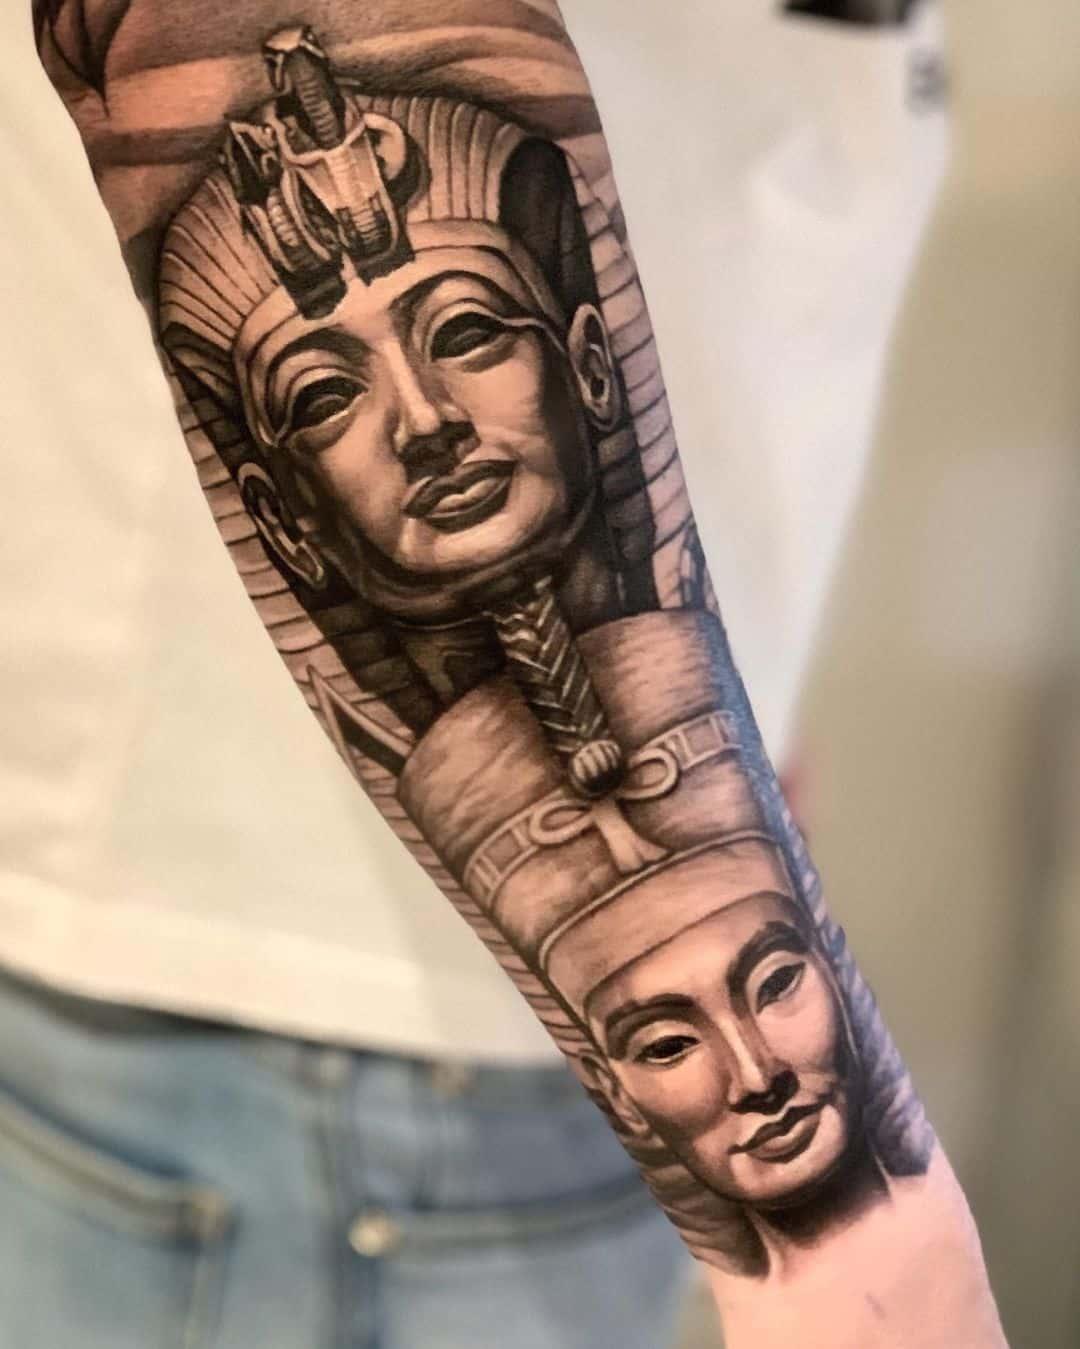 Queen Nefertiti Tattoo Meaning : queen, nefertiti, tattoo, meaning, African, Queen, Tattoo, Ideas, Majestic, Inspiration